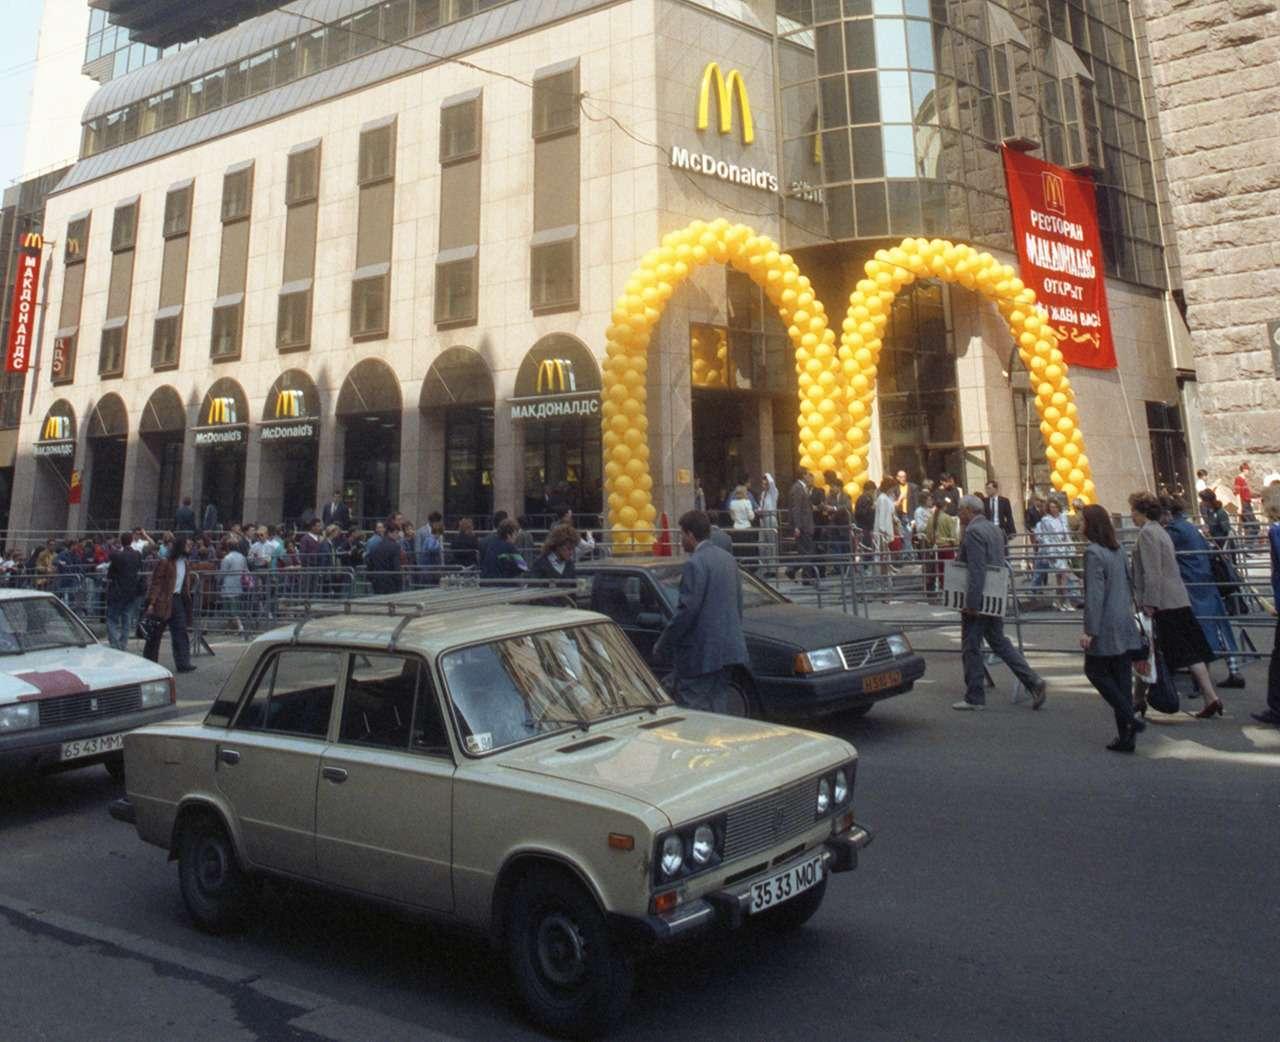 25лет назад: бензин 1960 руб., ВАЗ— 47млн— помните такое?— фото 1165298